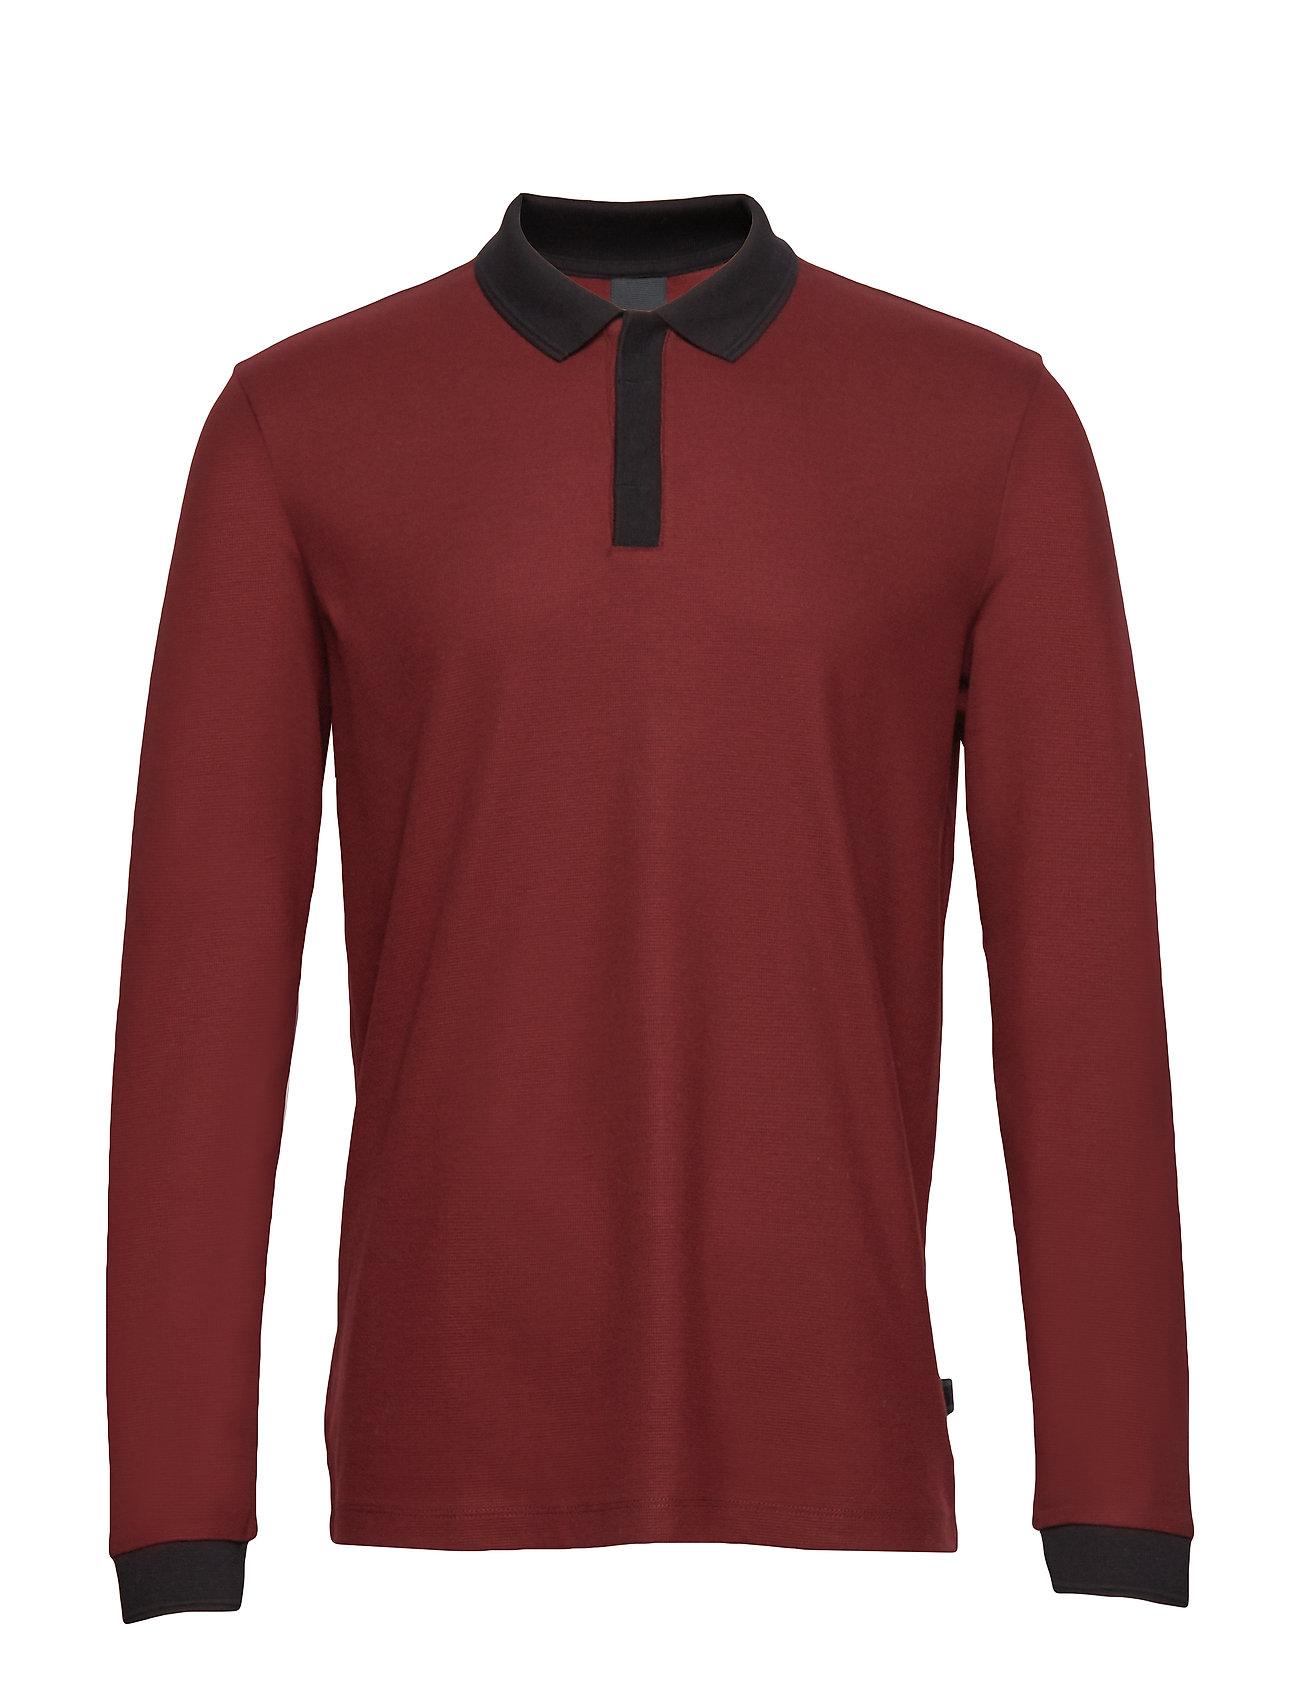 BOSS Business Wear Pittman 02_WS - DARK RED